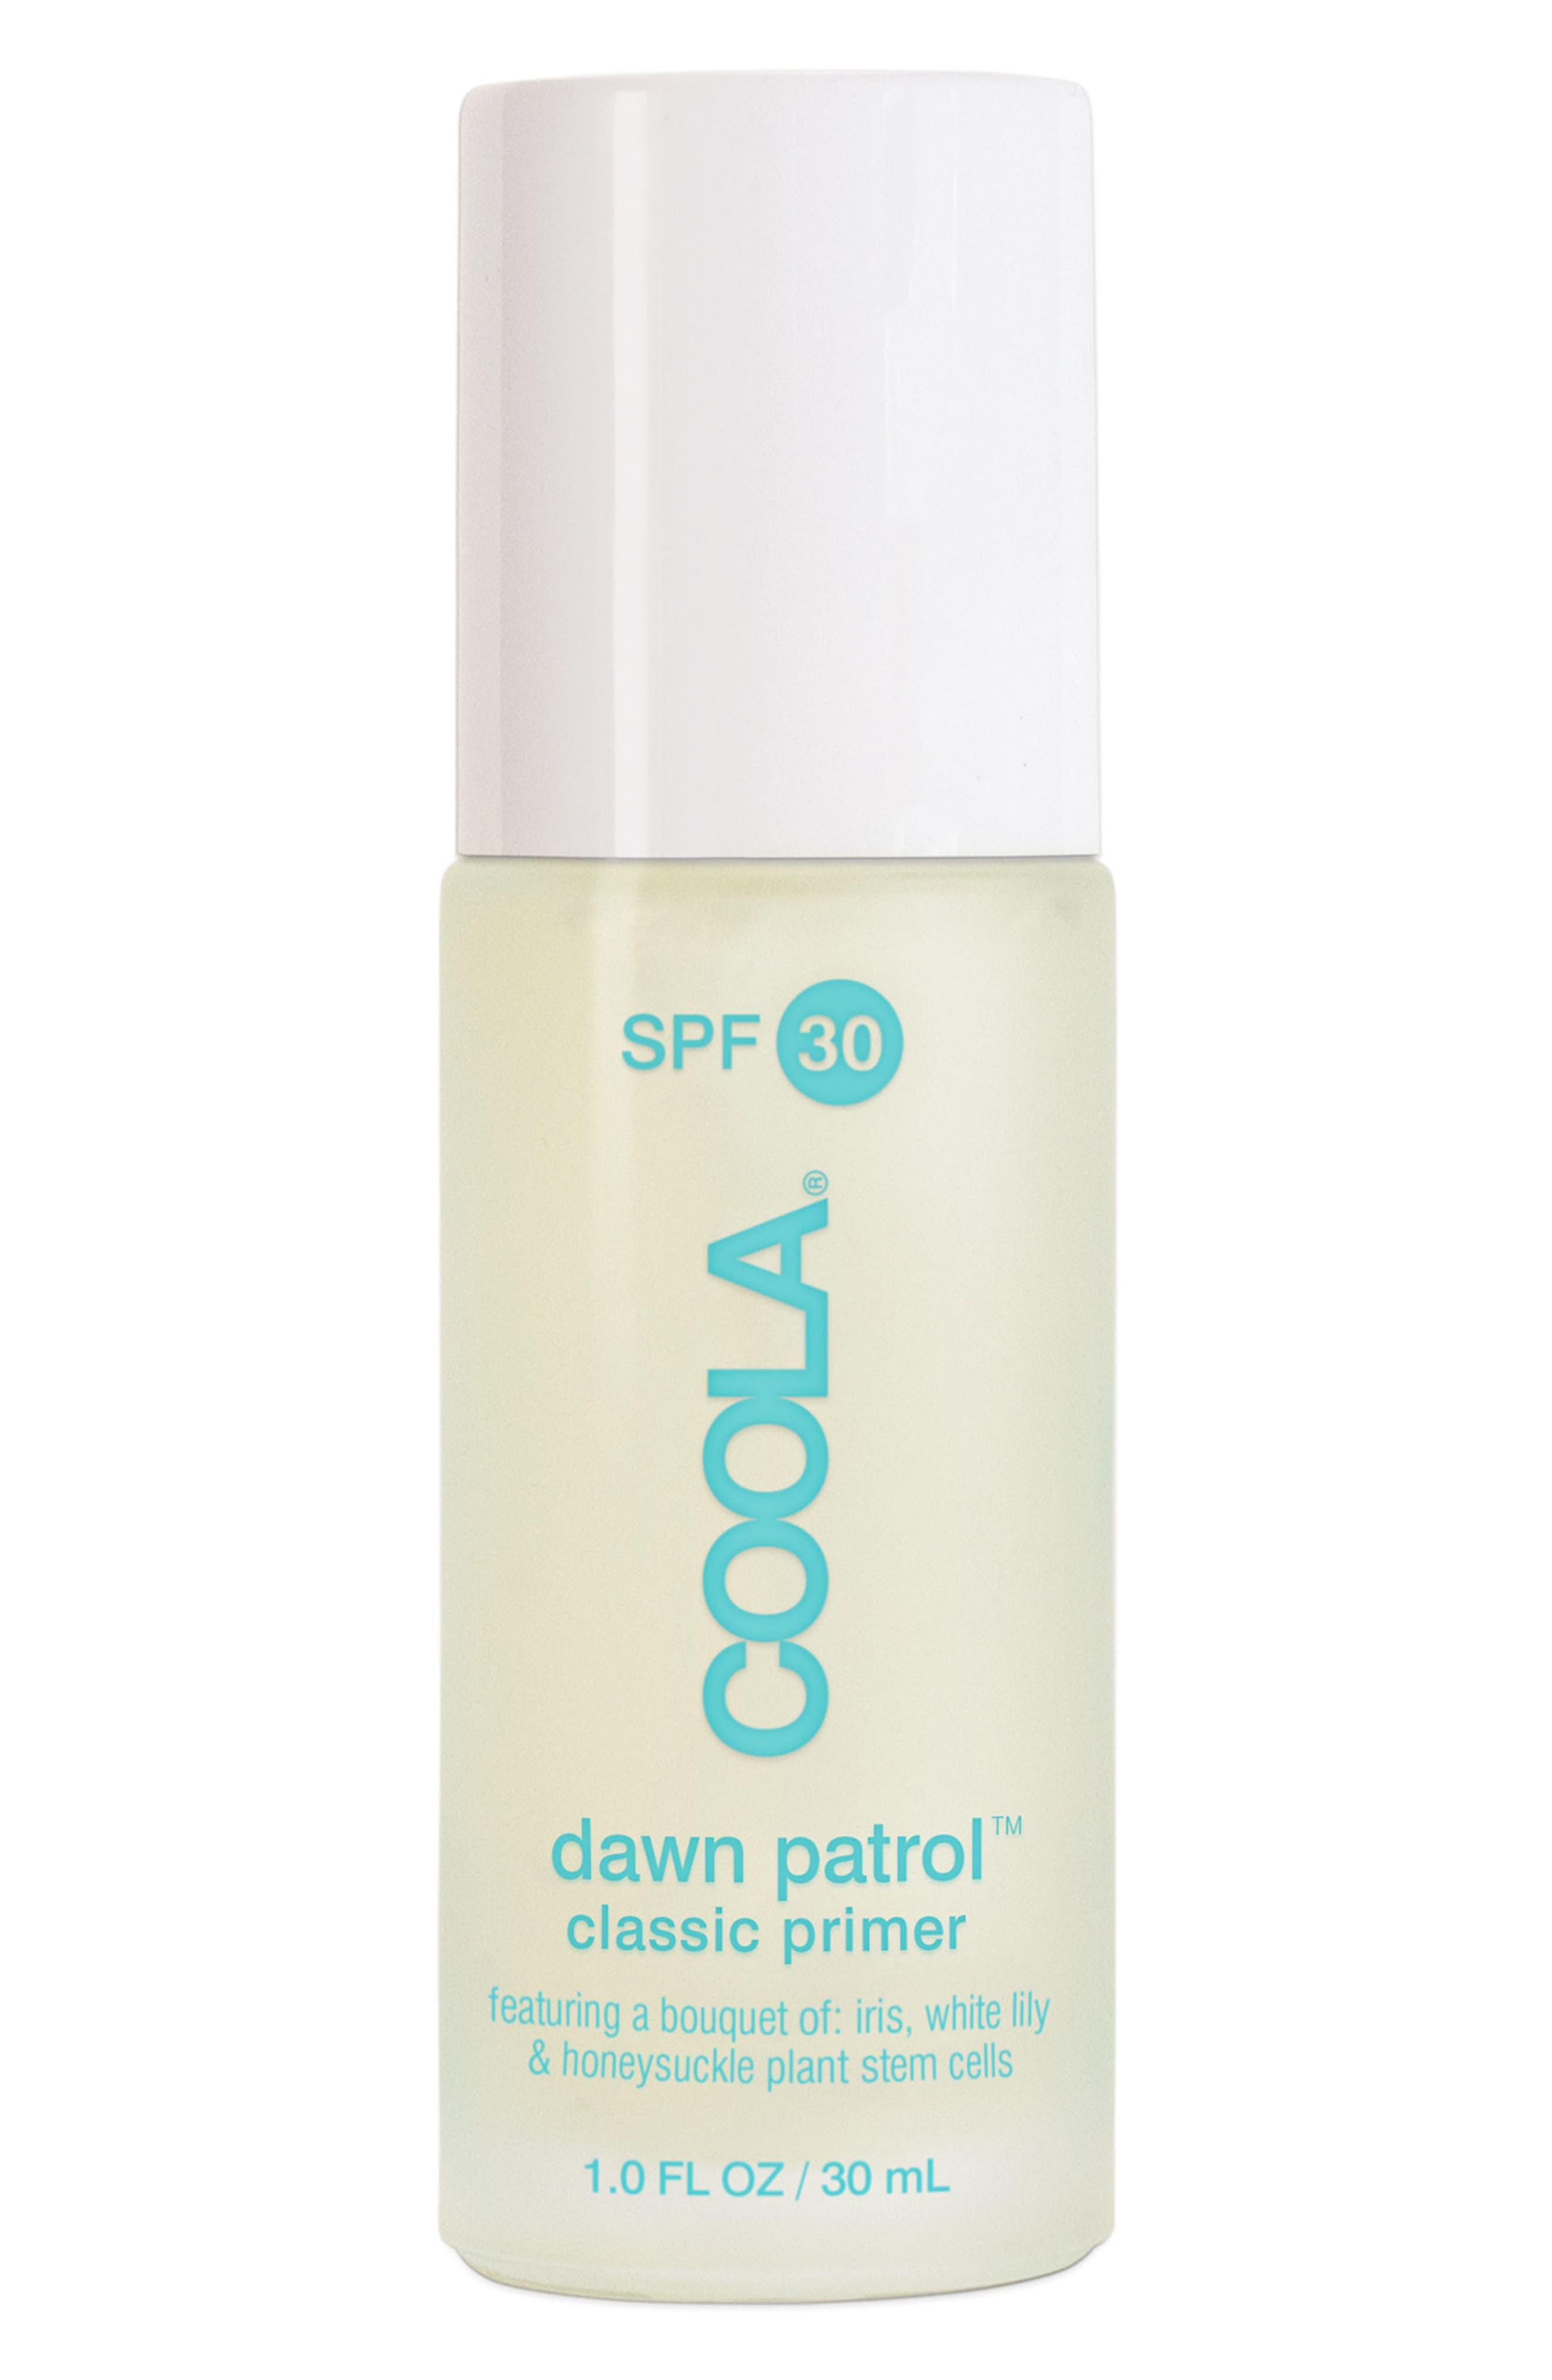 COOLA® Suncare Dawn Patrol™ Classic Makeup Primer SPF 30